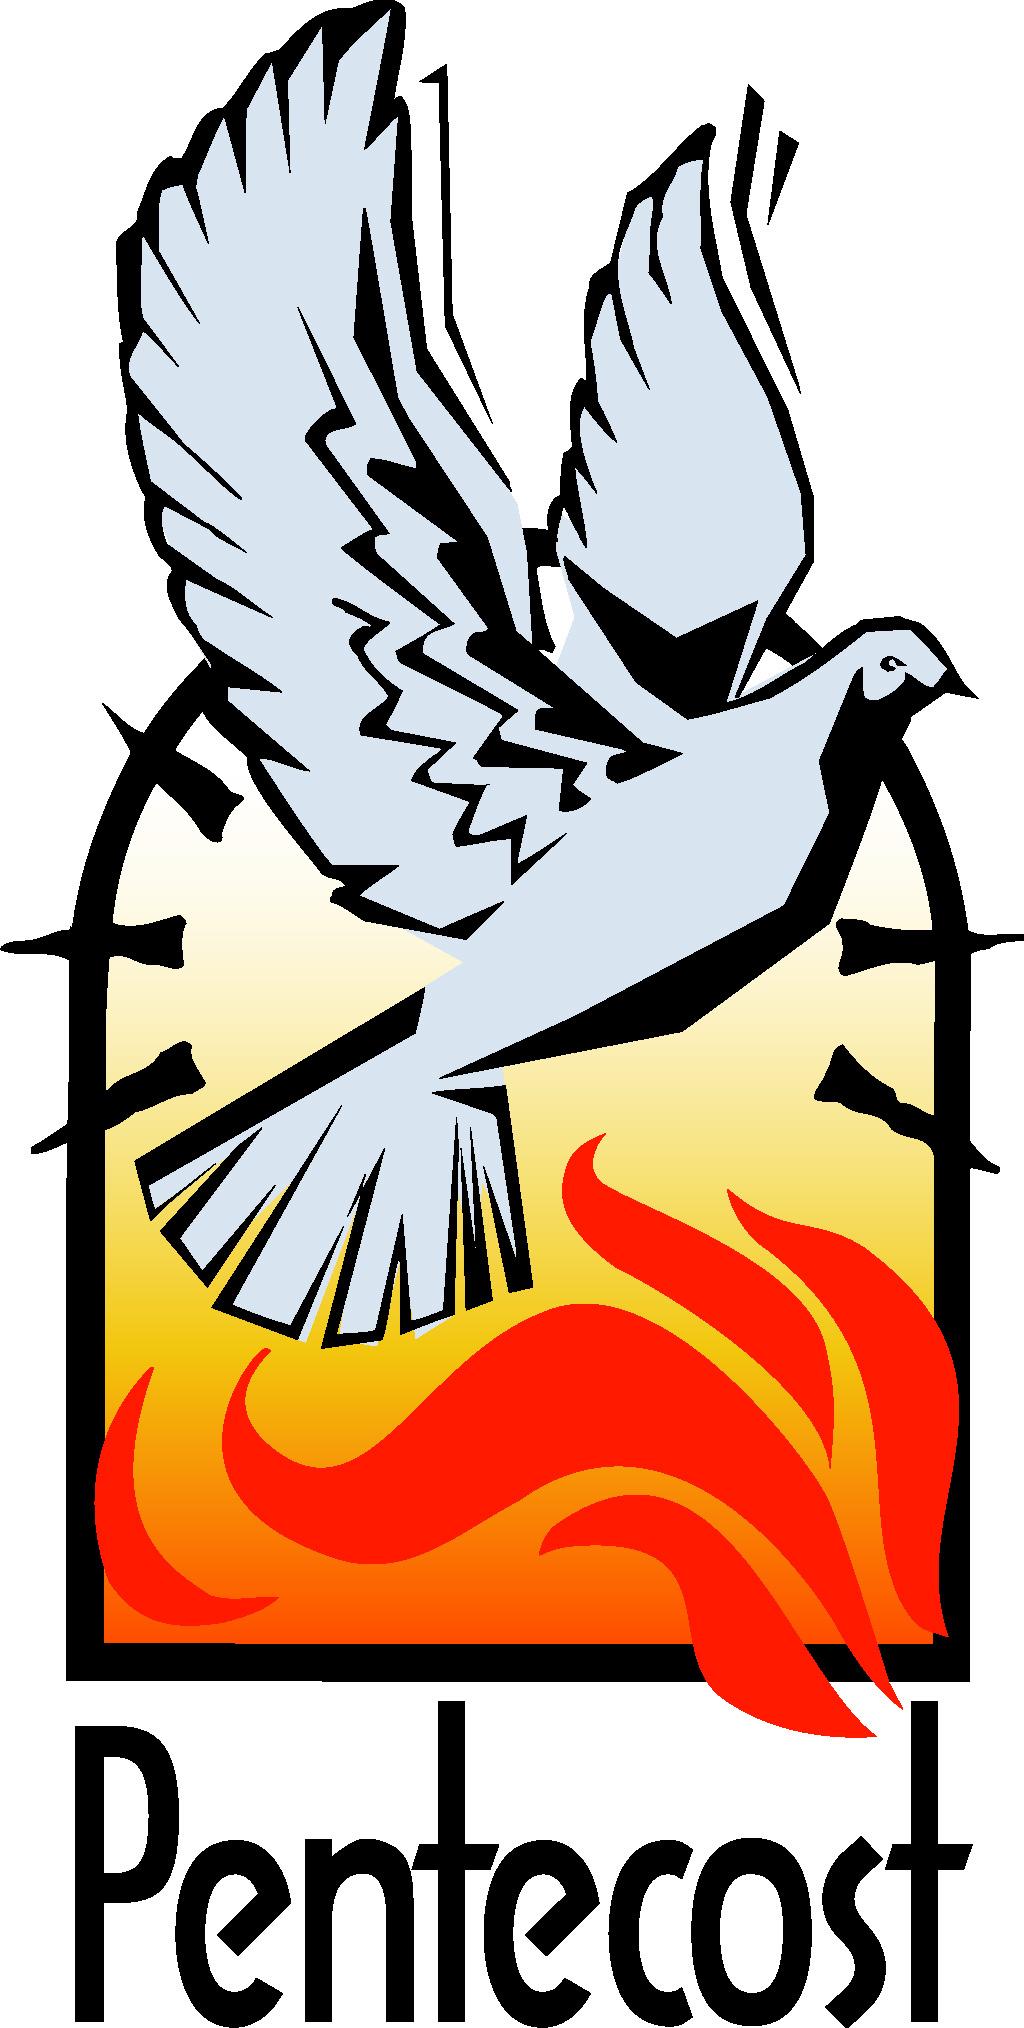 Pentecost Sunday Clip Art N8 free image.